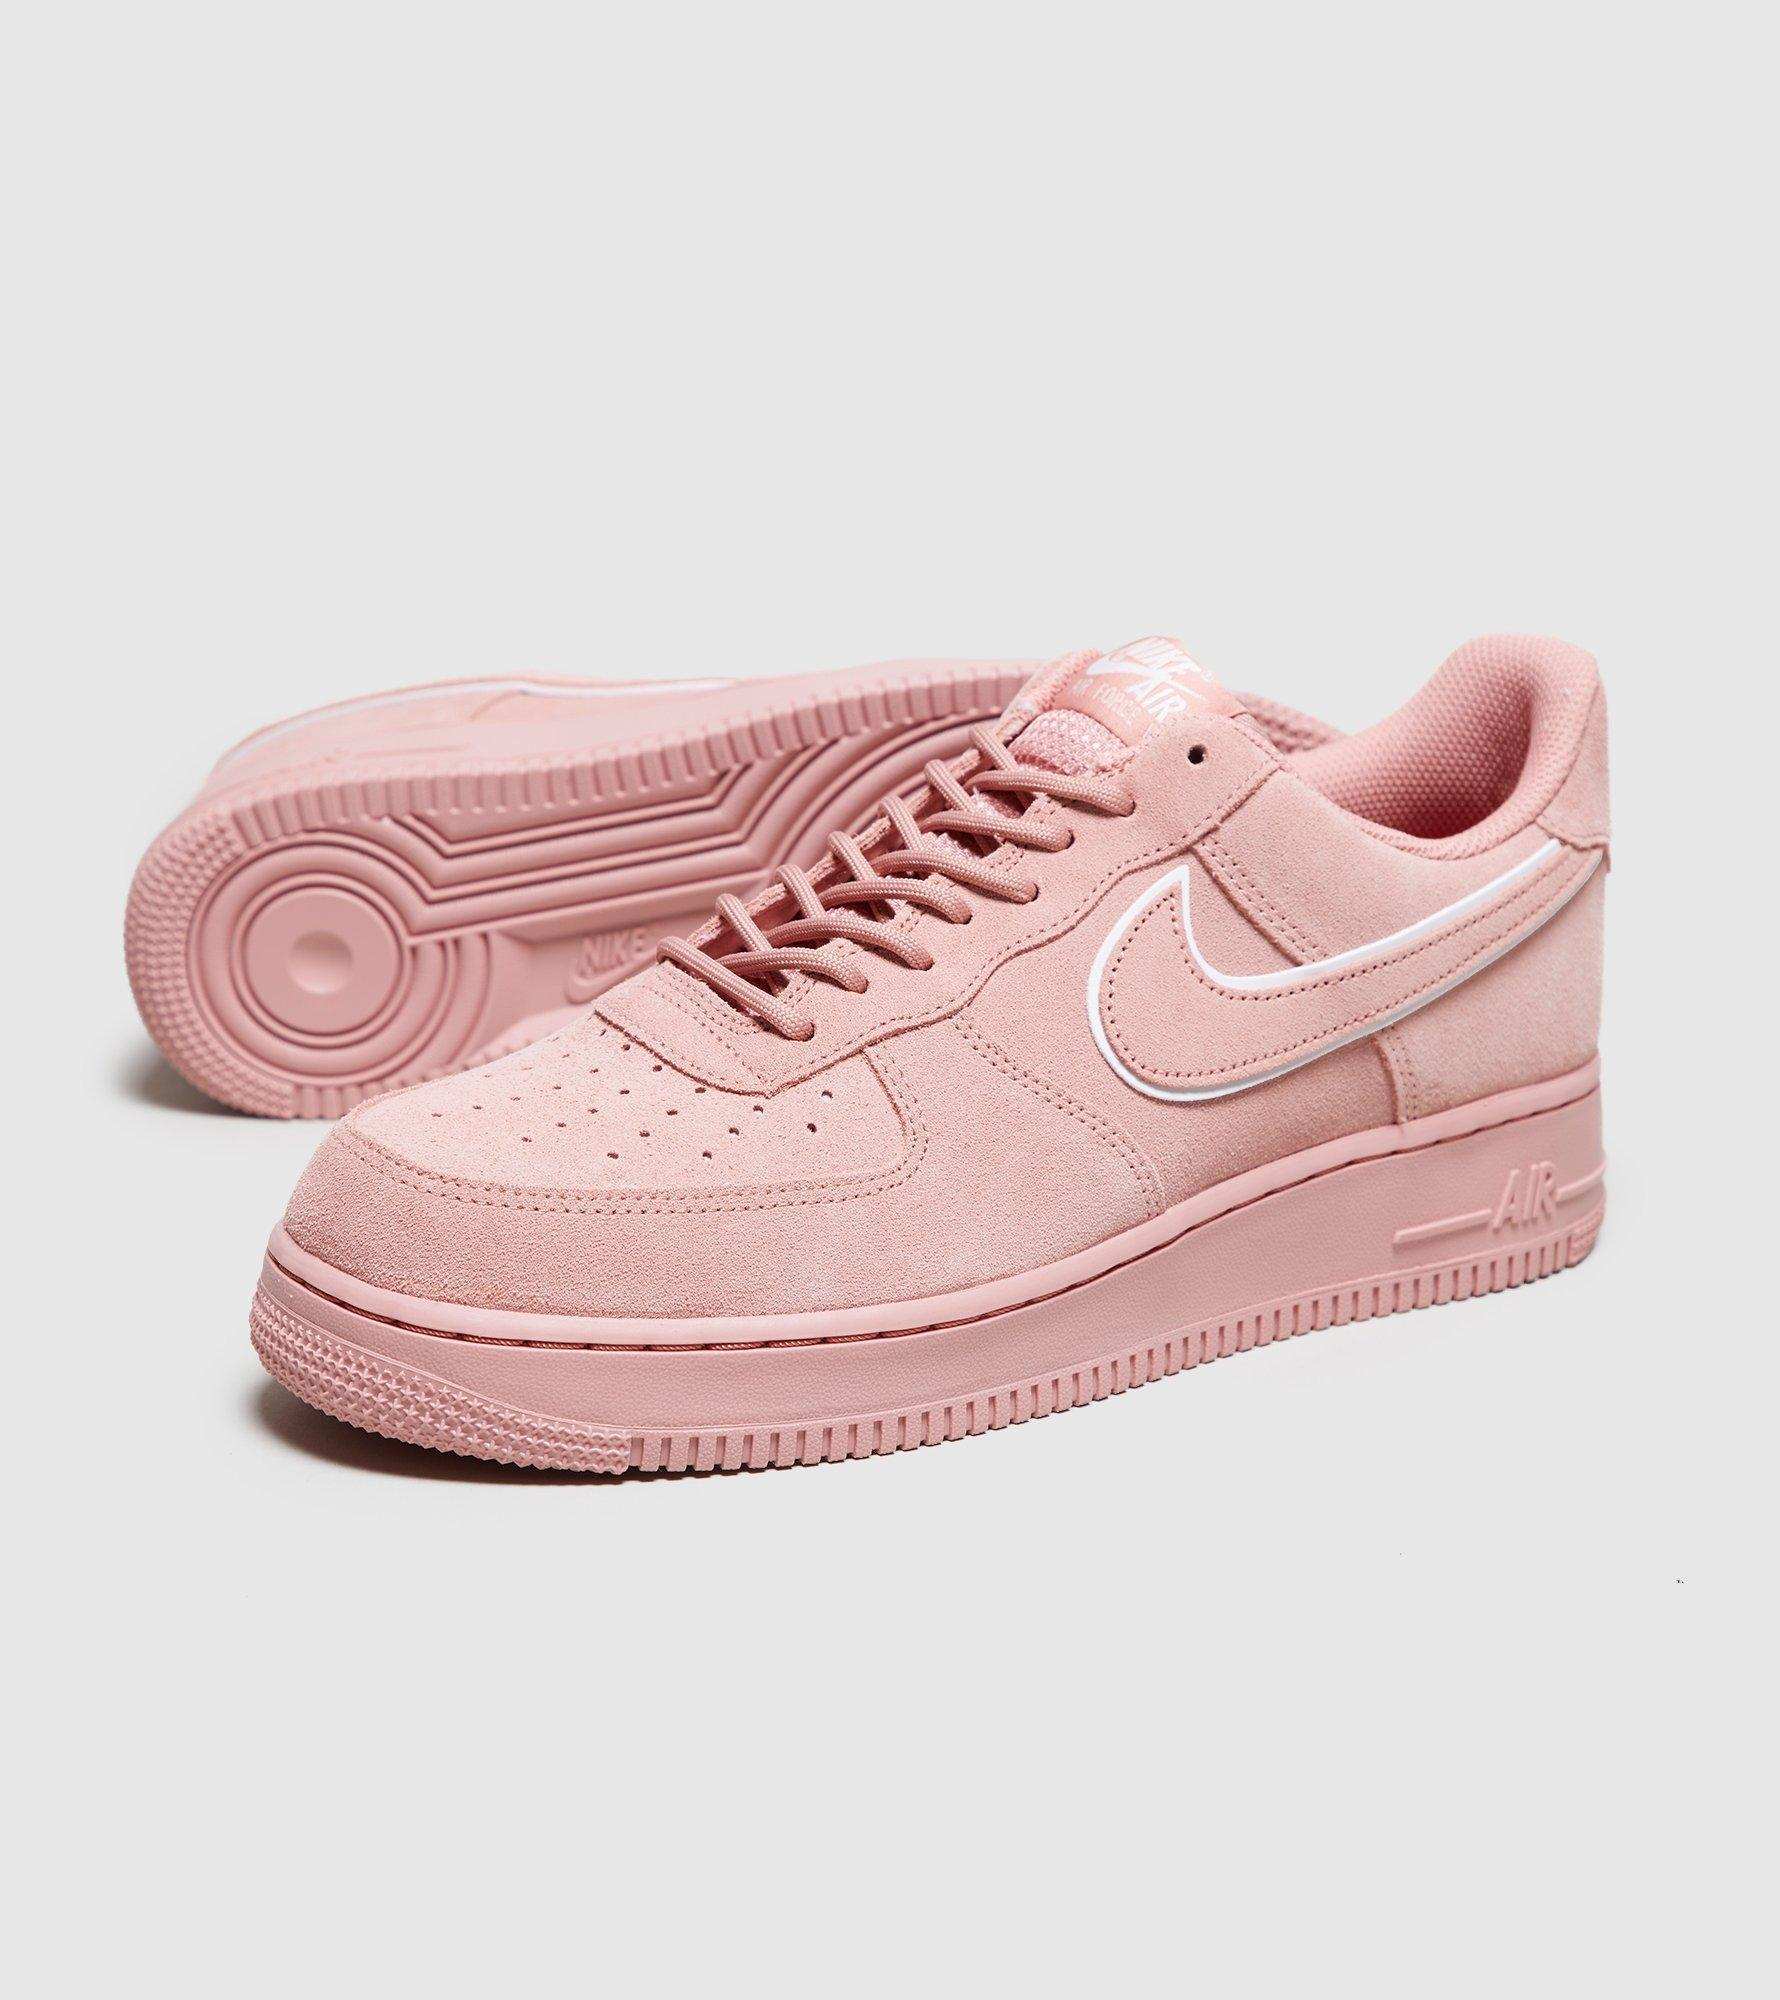 Lyst Nike Air Force Color 1 Lv8 Suede En Color Force Rosa e53bf7